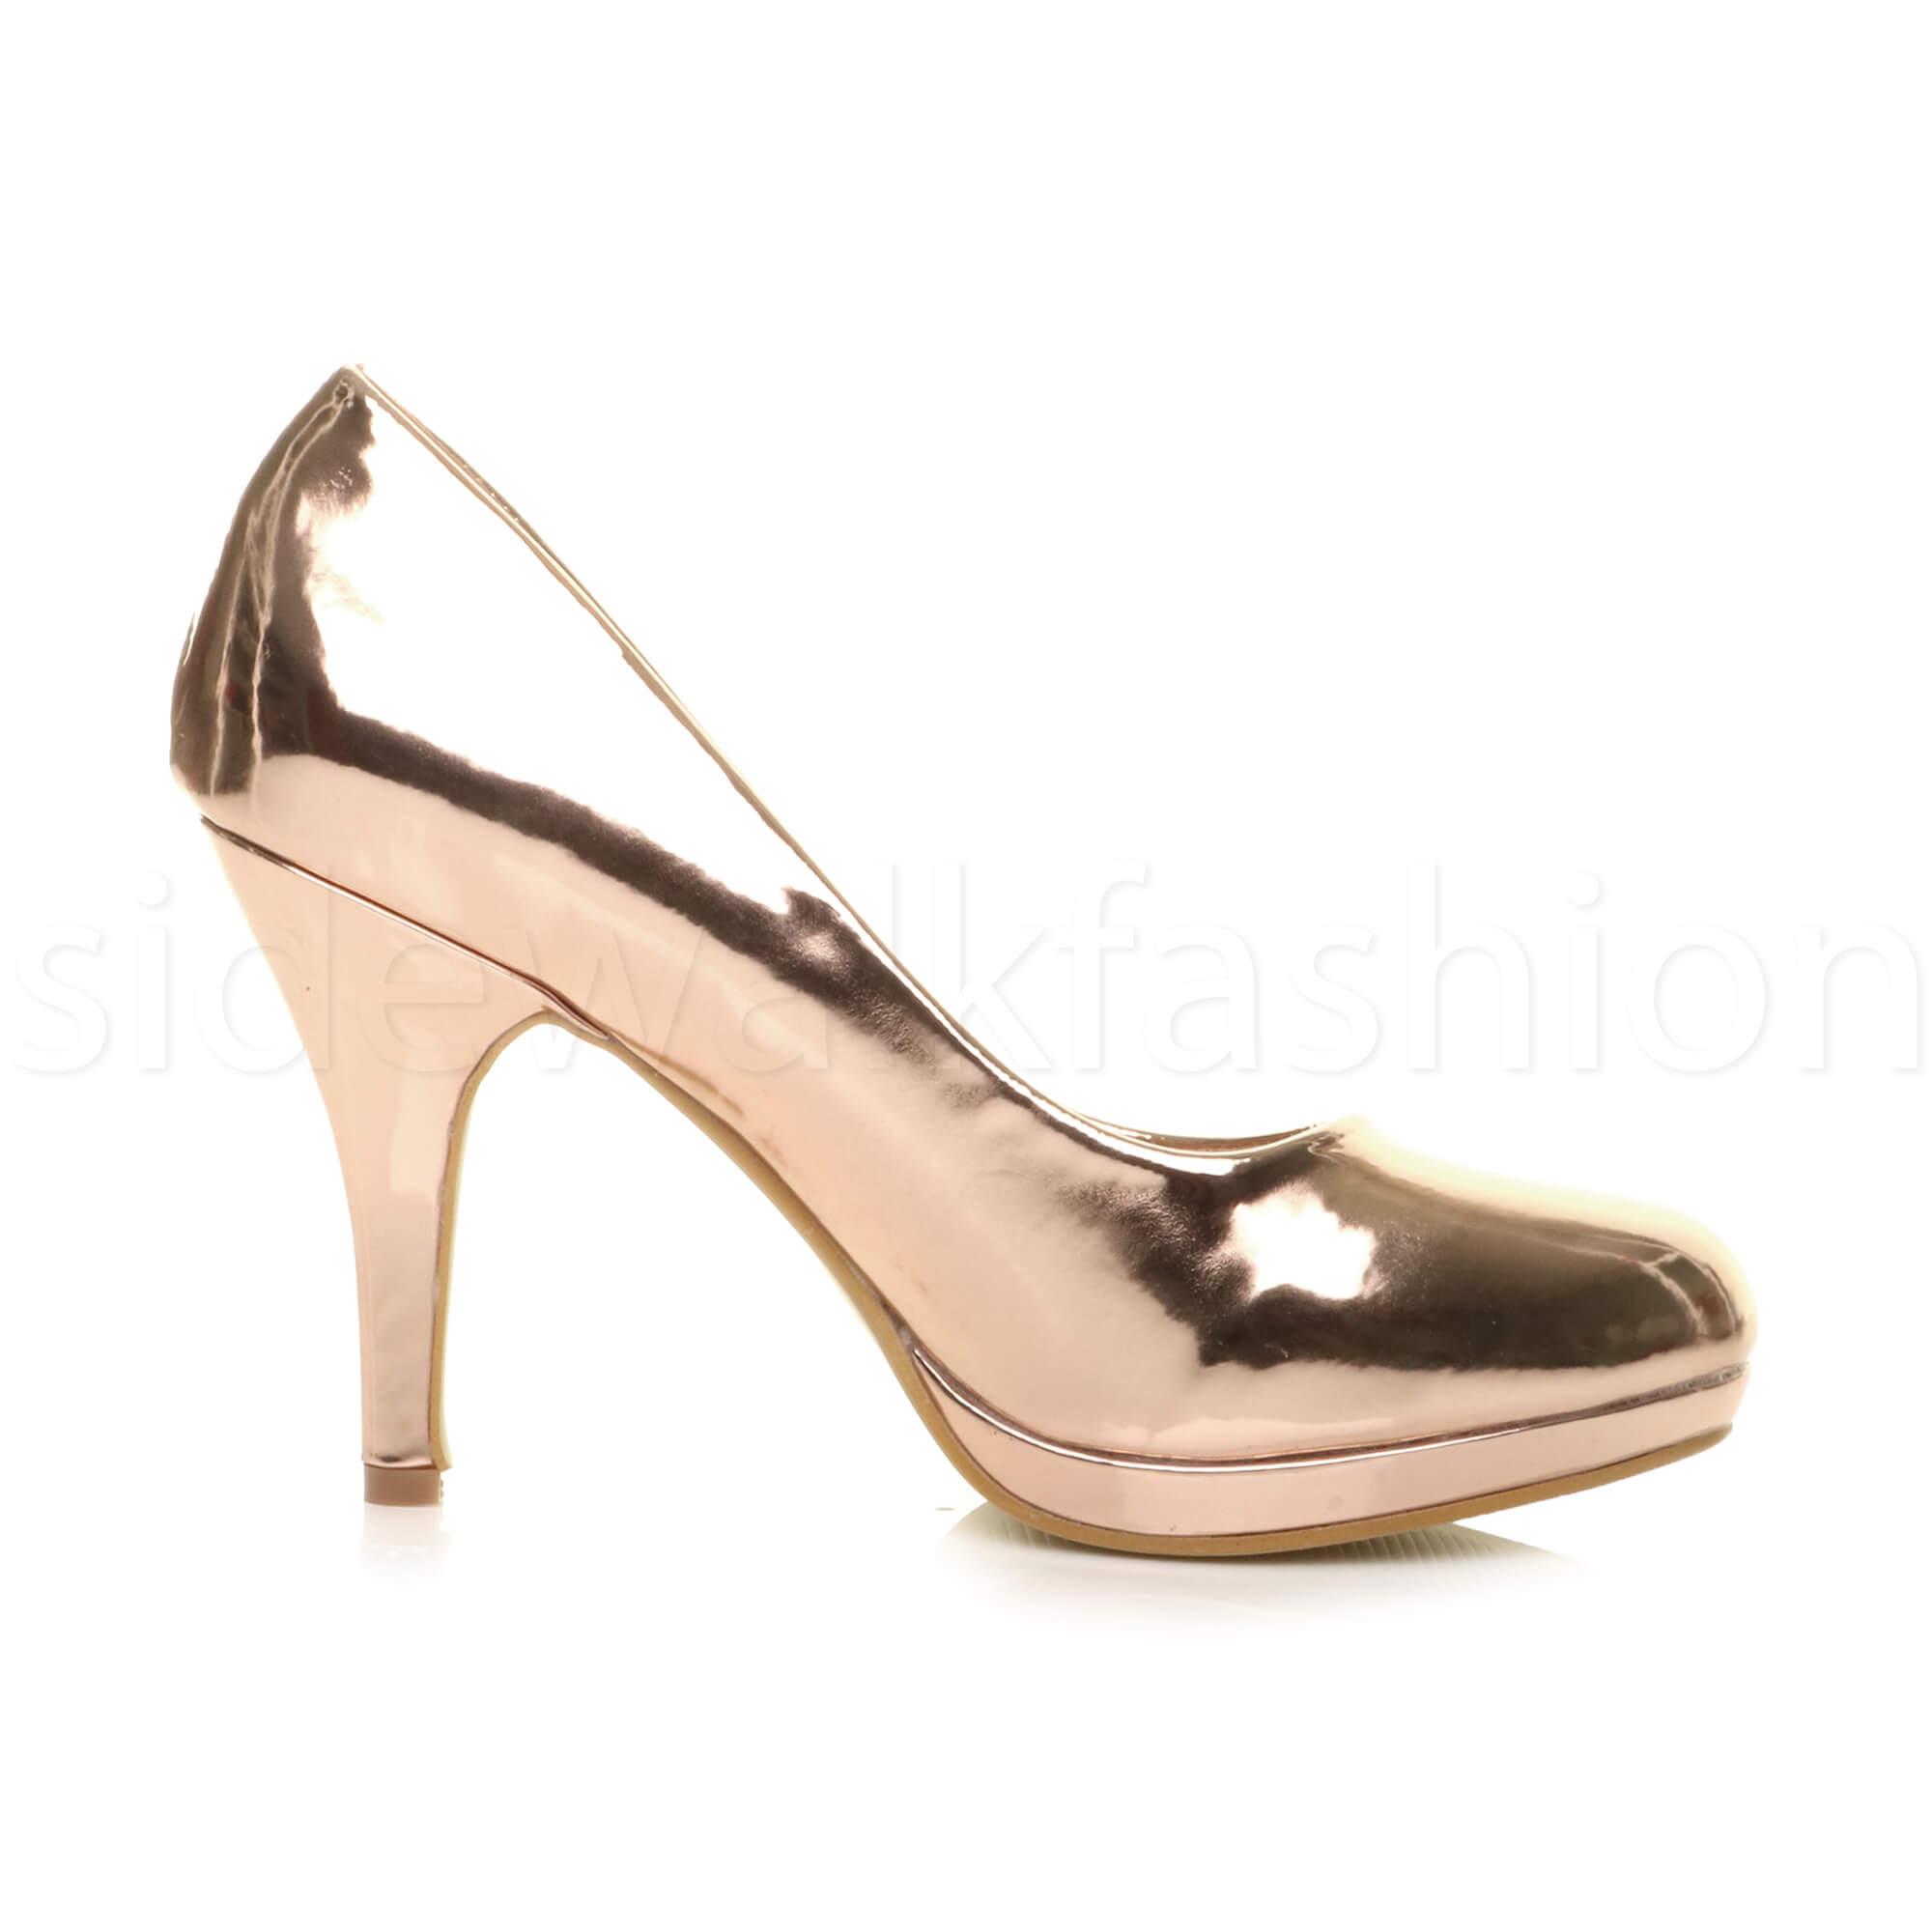 Womens-ladies-high-mid-heel-platform-wedding-evening-bridesmaid-court-shoes-size thumbnail 158